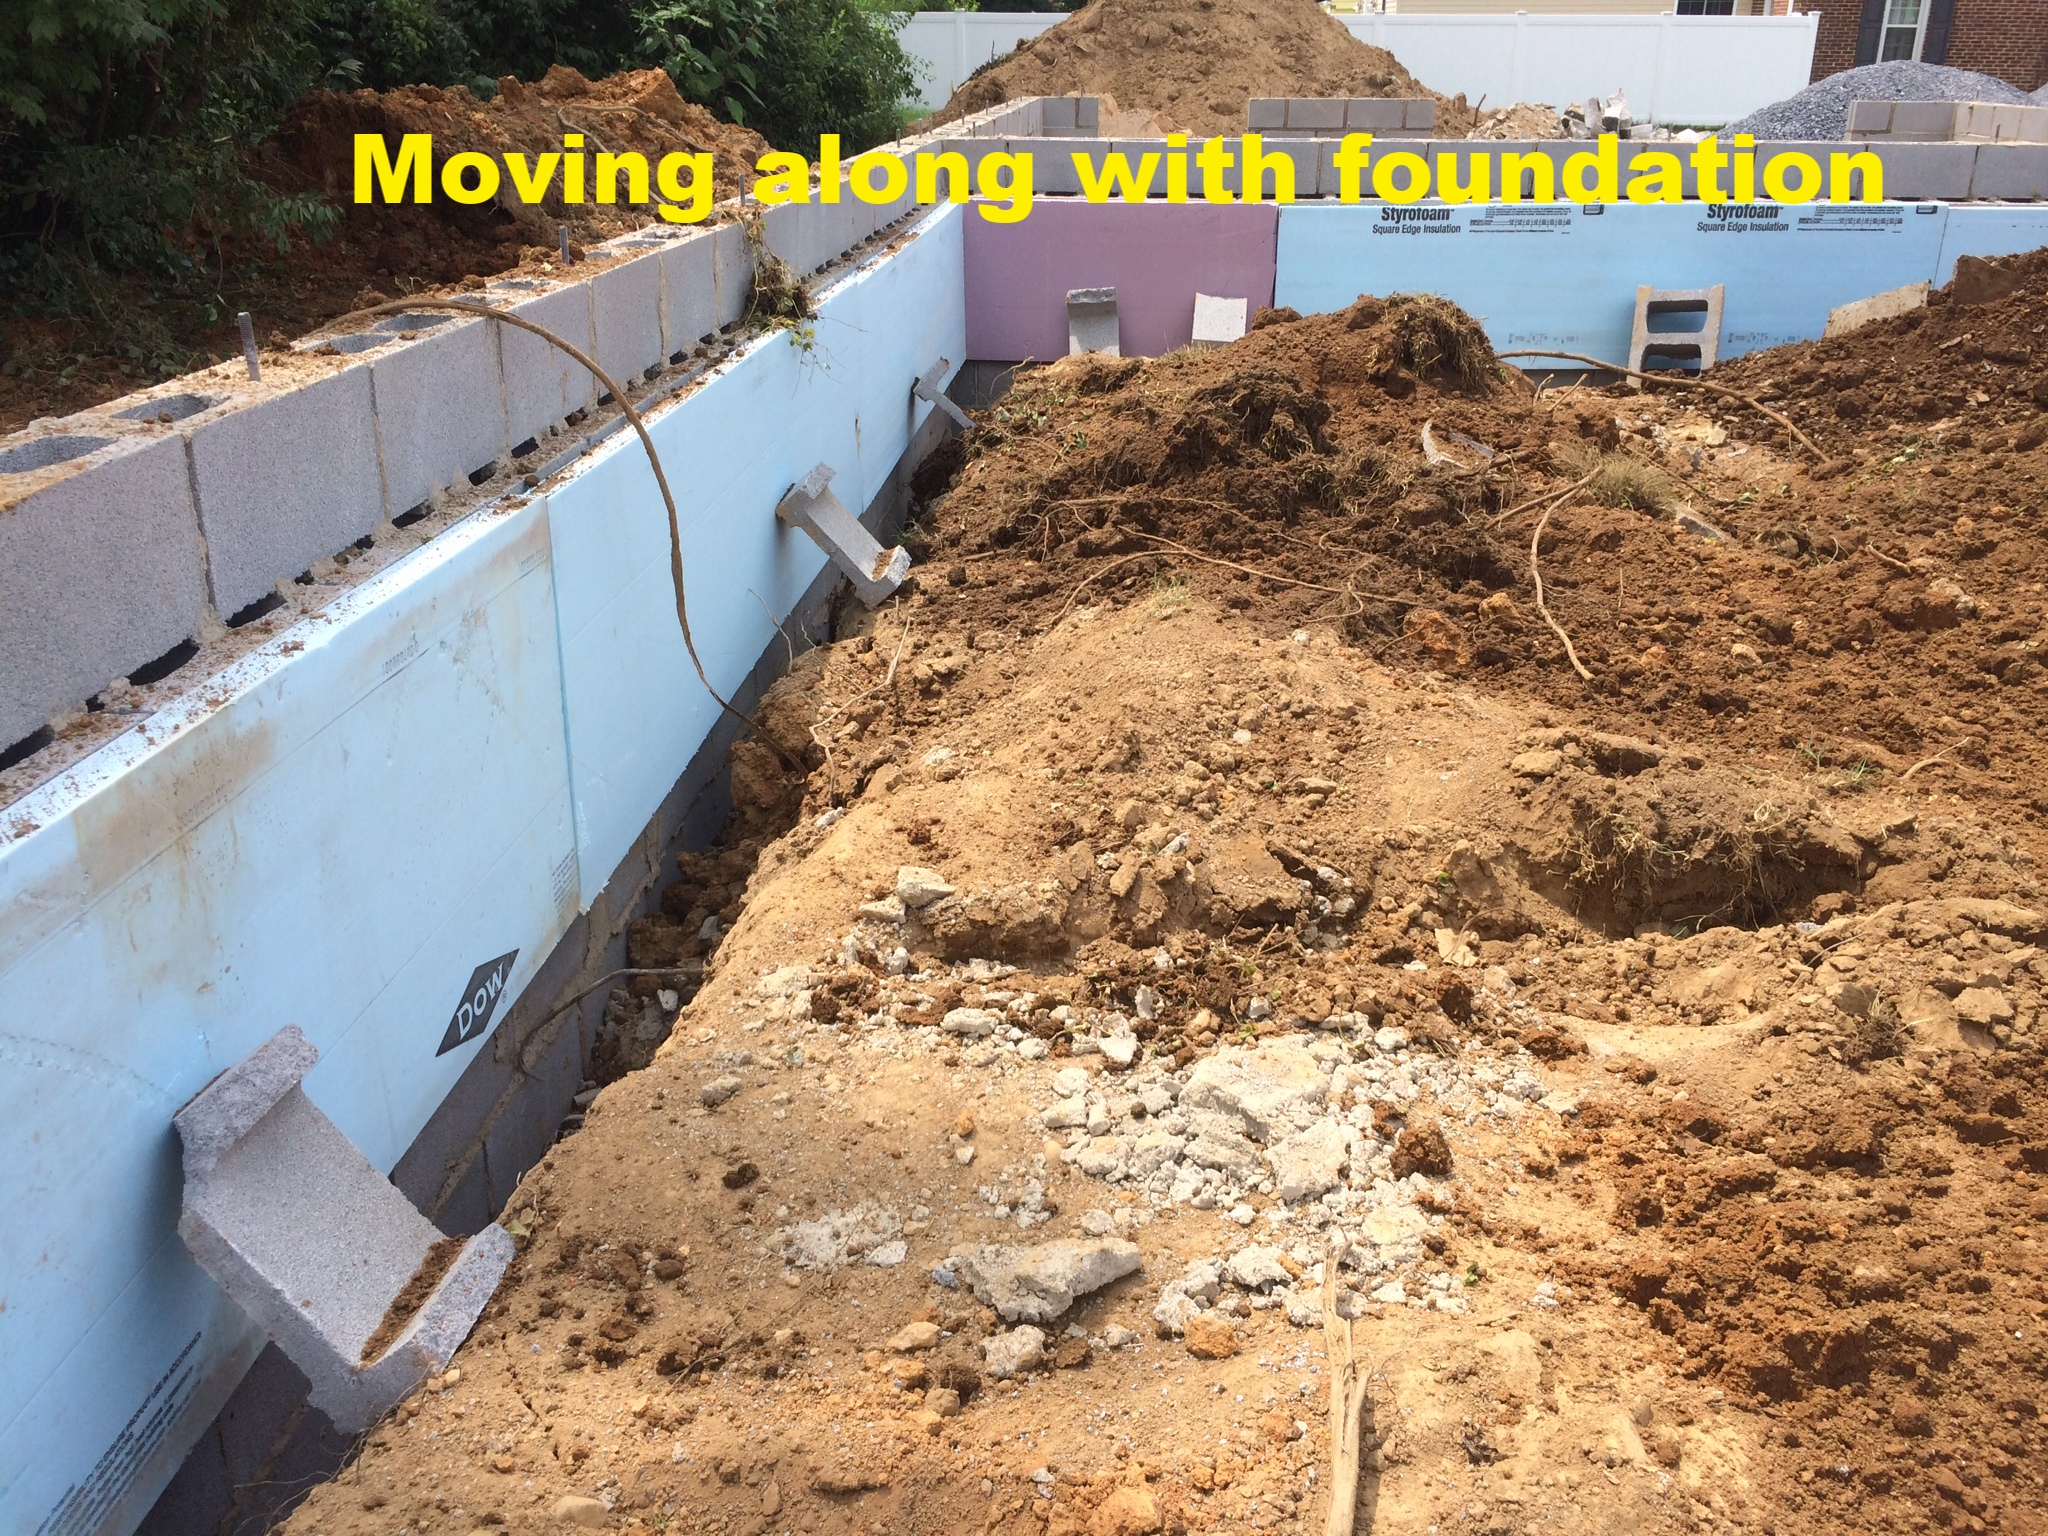 07.19.17_foundation work 3.JPG